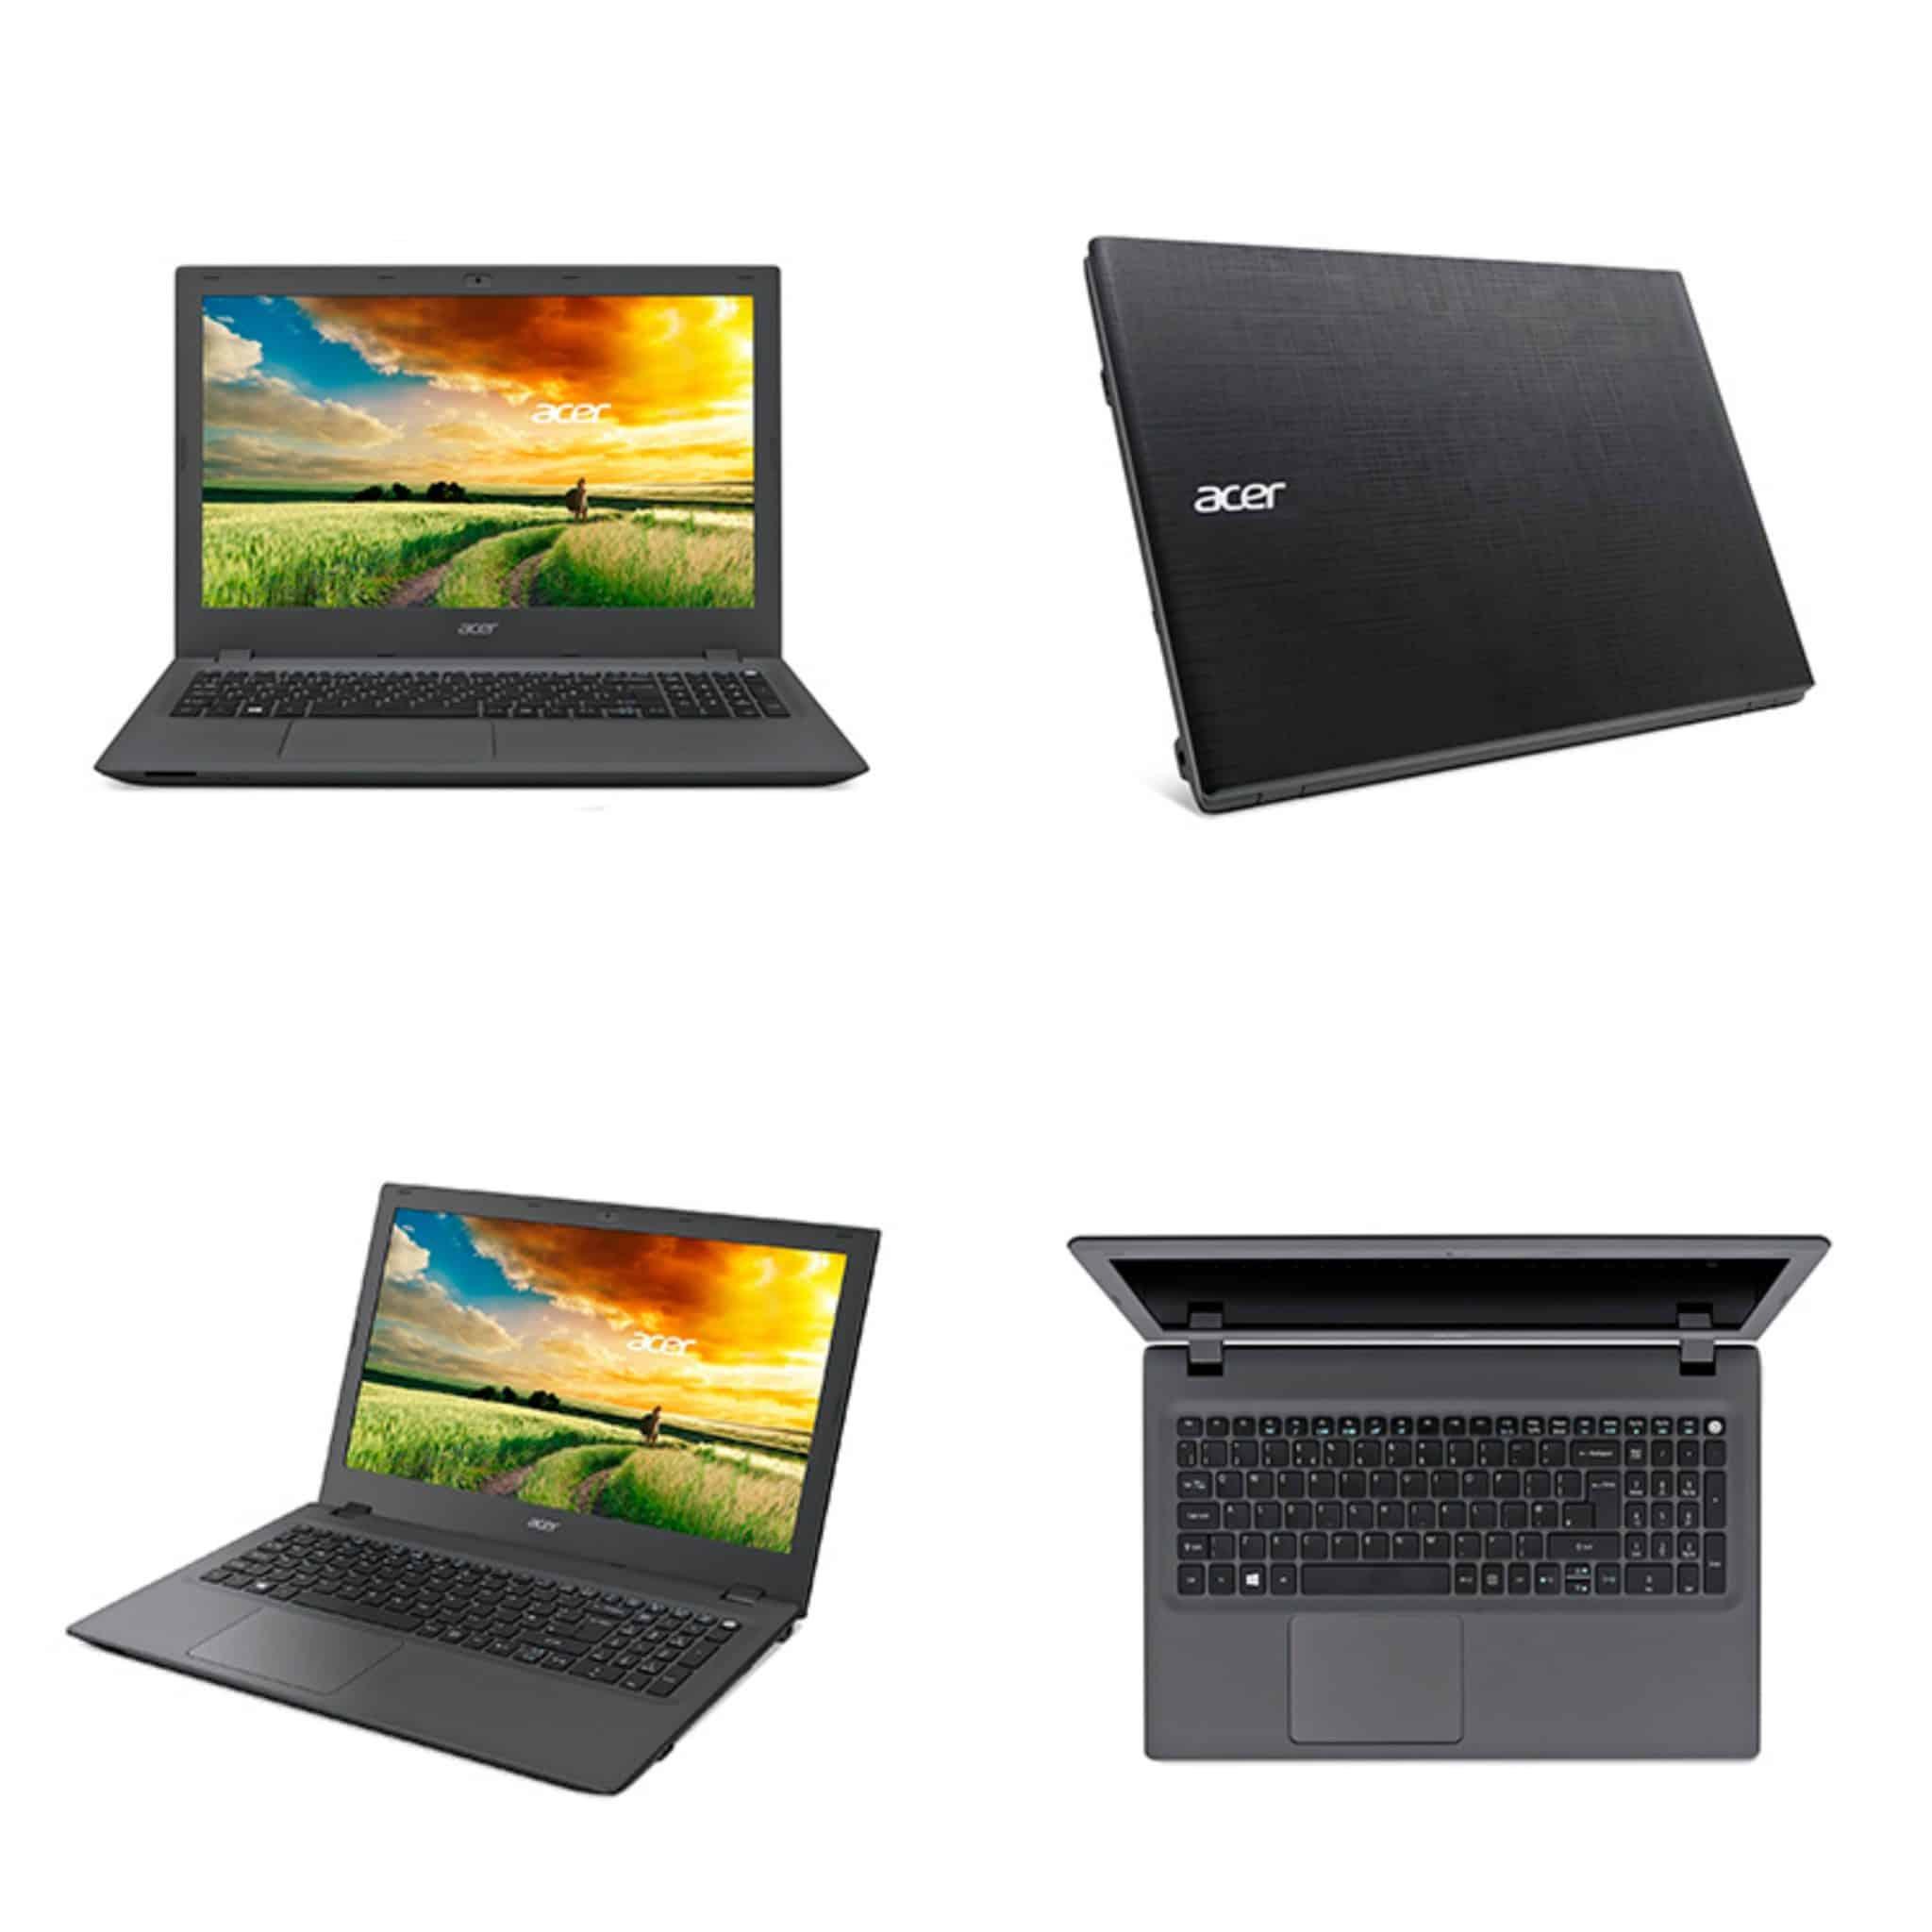 Acer Aspire E5-573G-32KQ